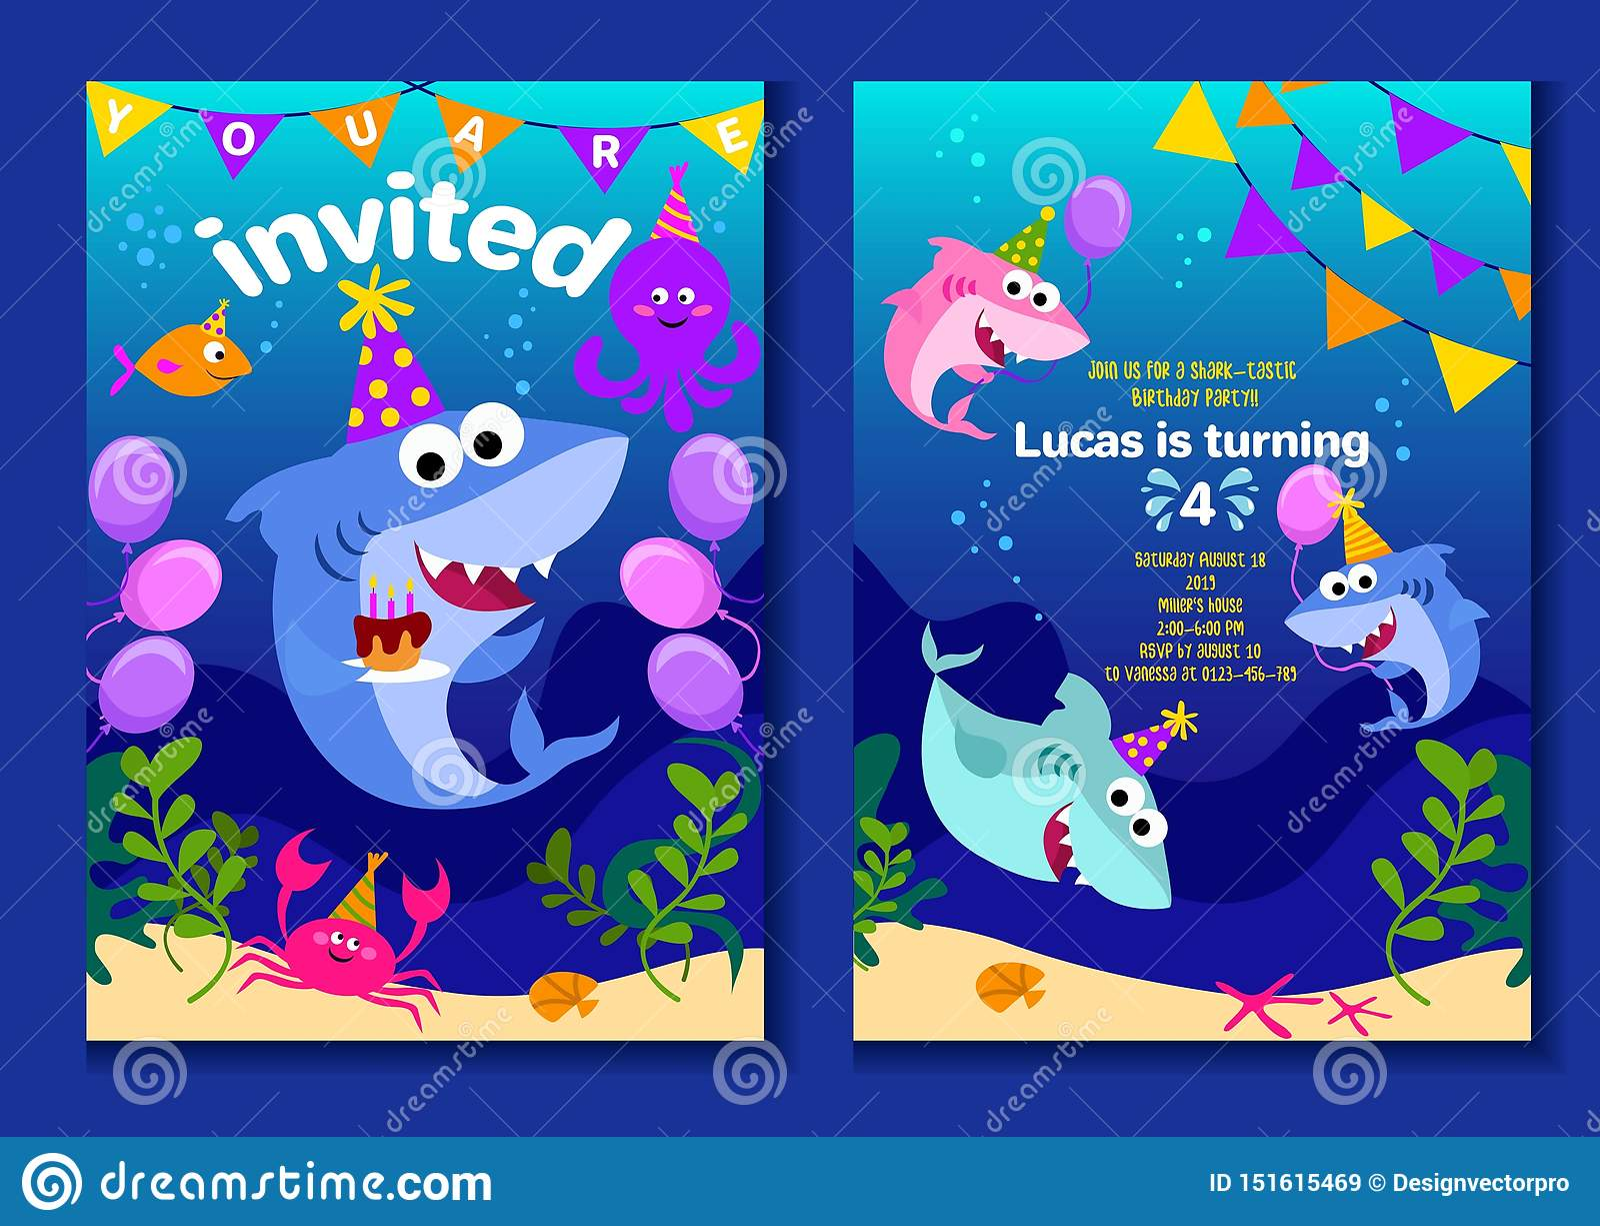 https www dreamstime com baby shark party invitation cards happy birthday greeting card cartoon style under sea world animals shark octopus image151615469